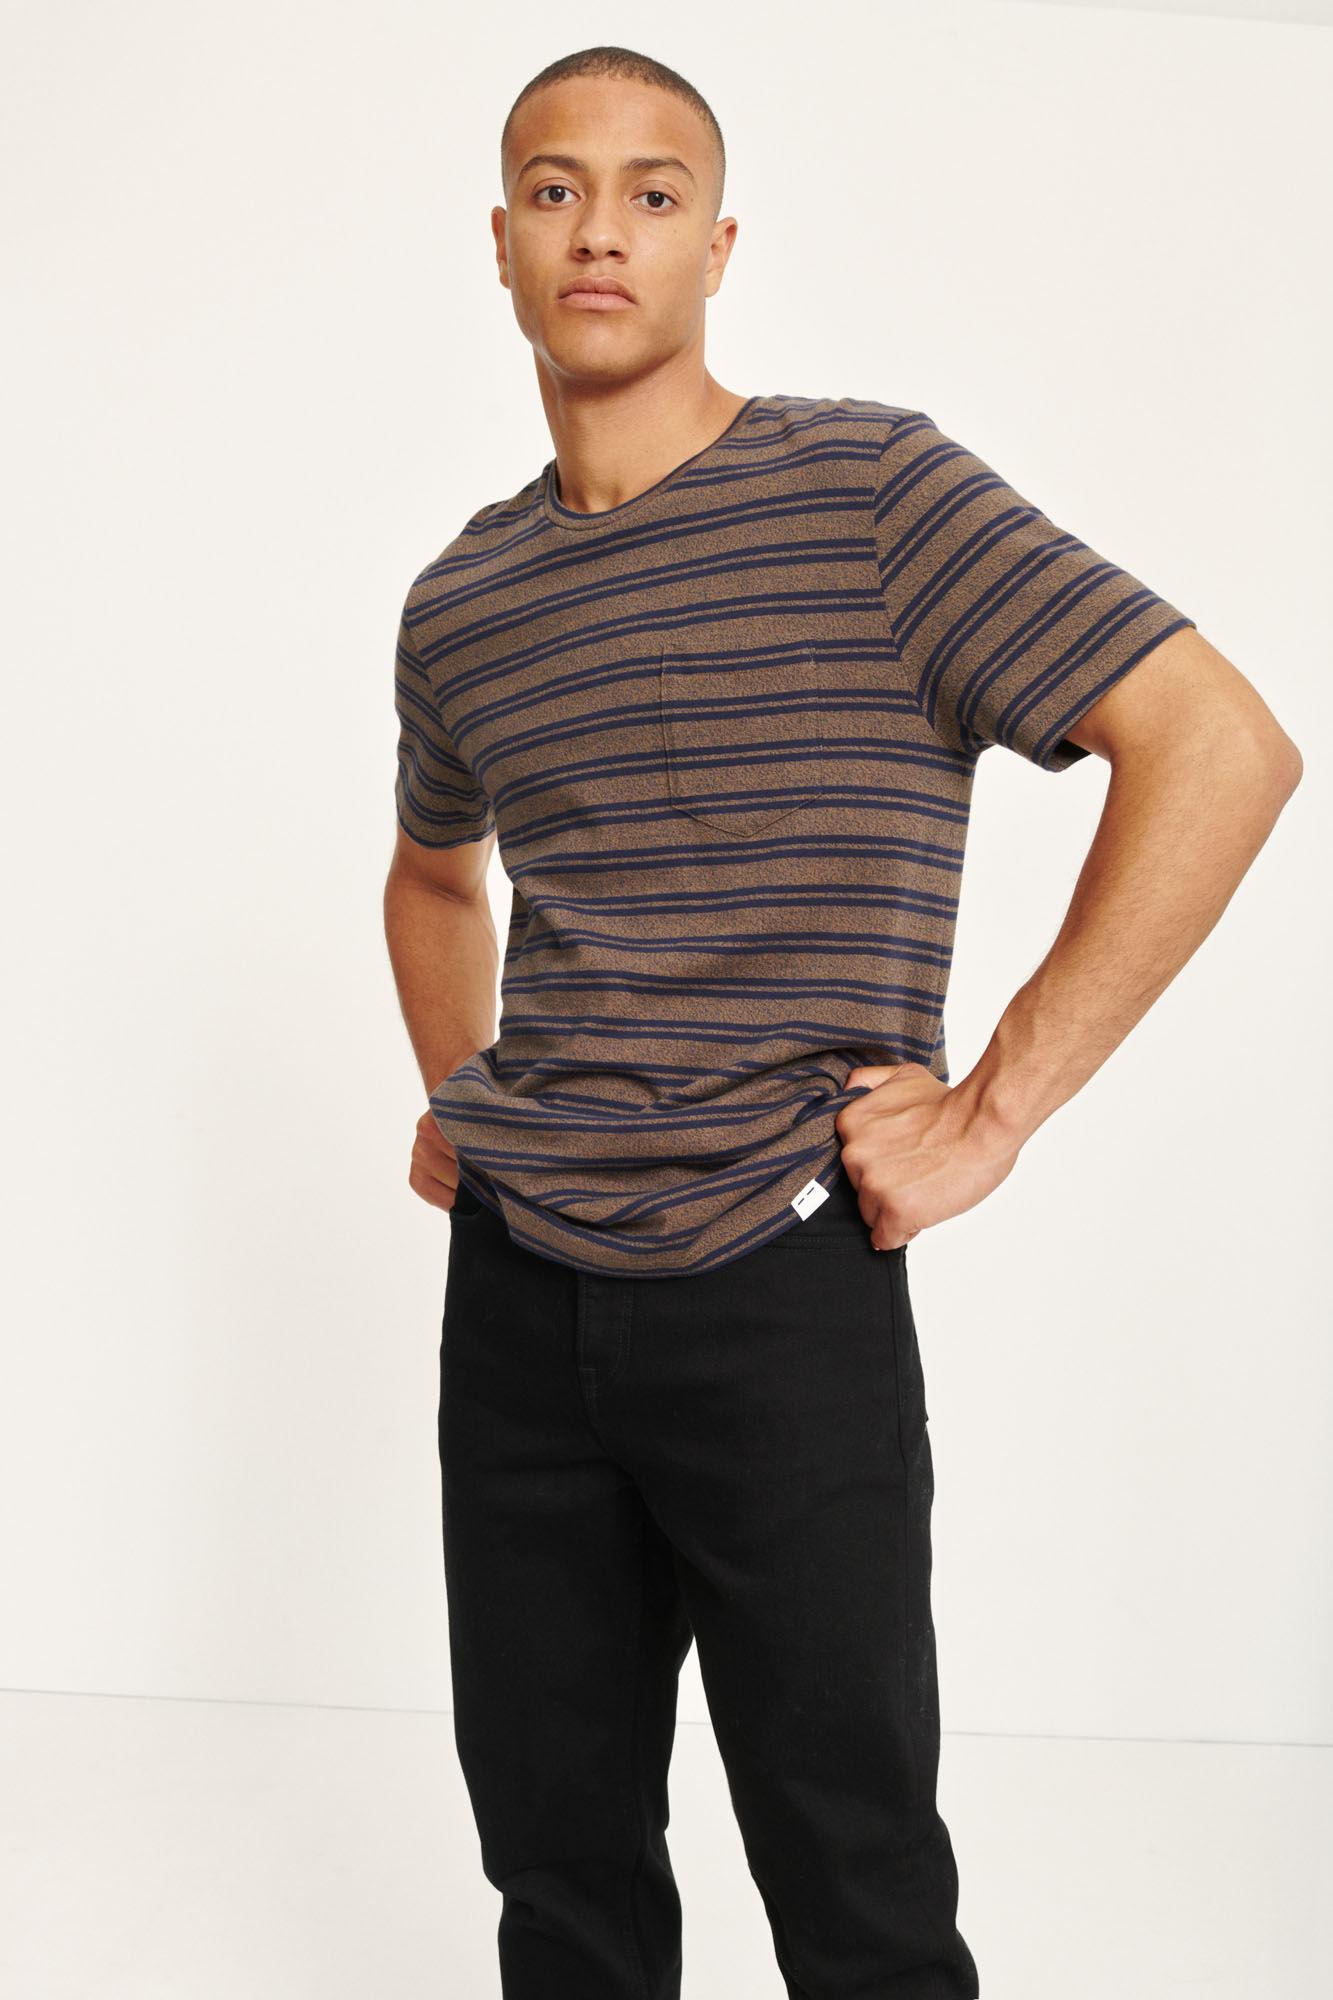 Carpo T-Shirt St Kangaroo Brown Blue Stripe 7888-1